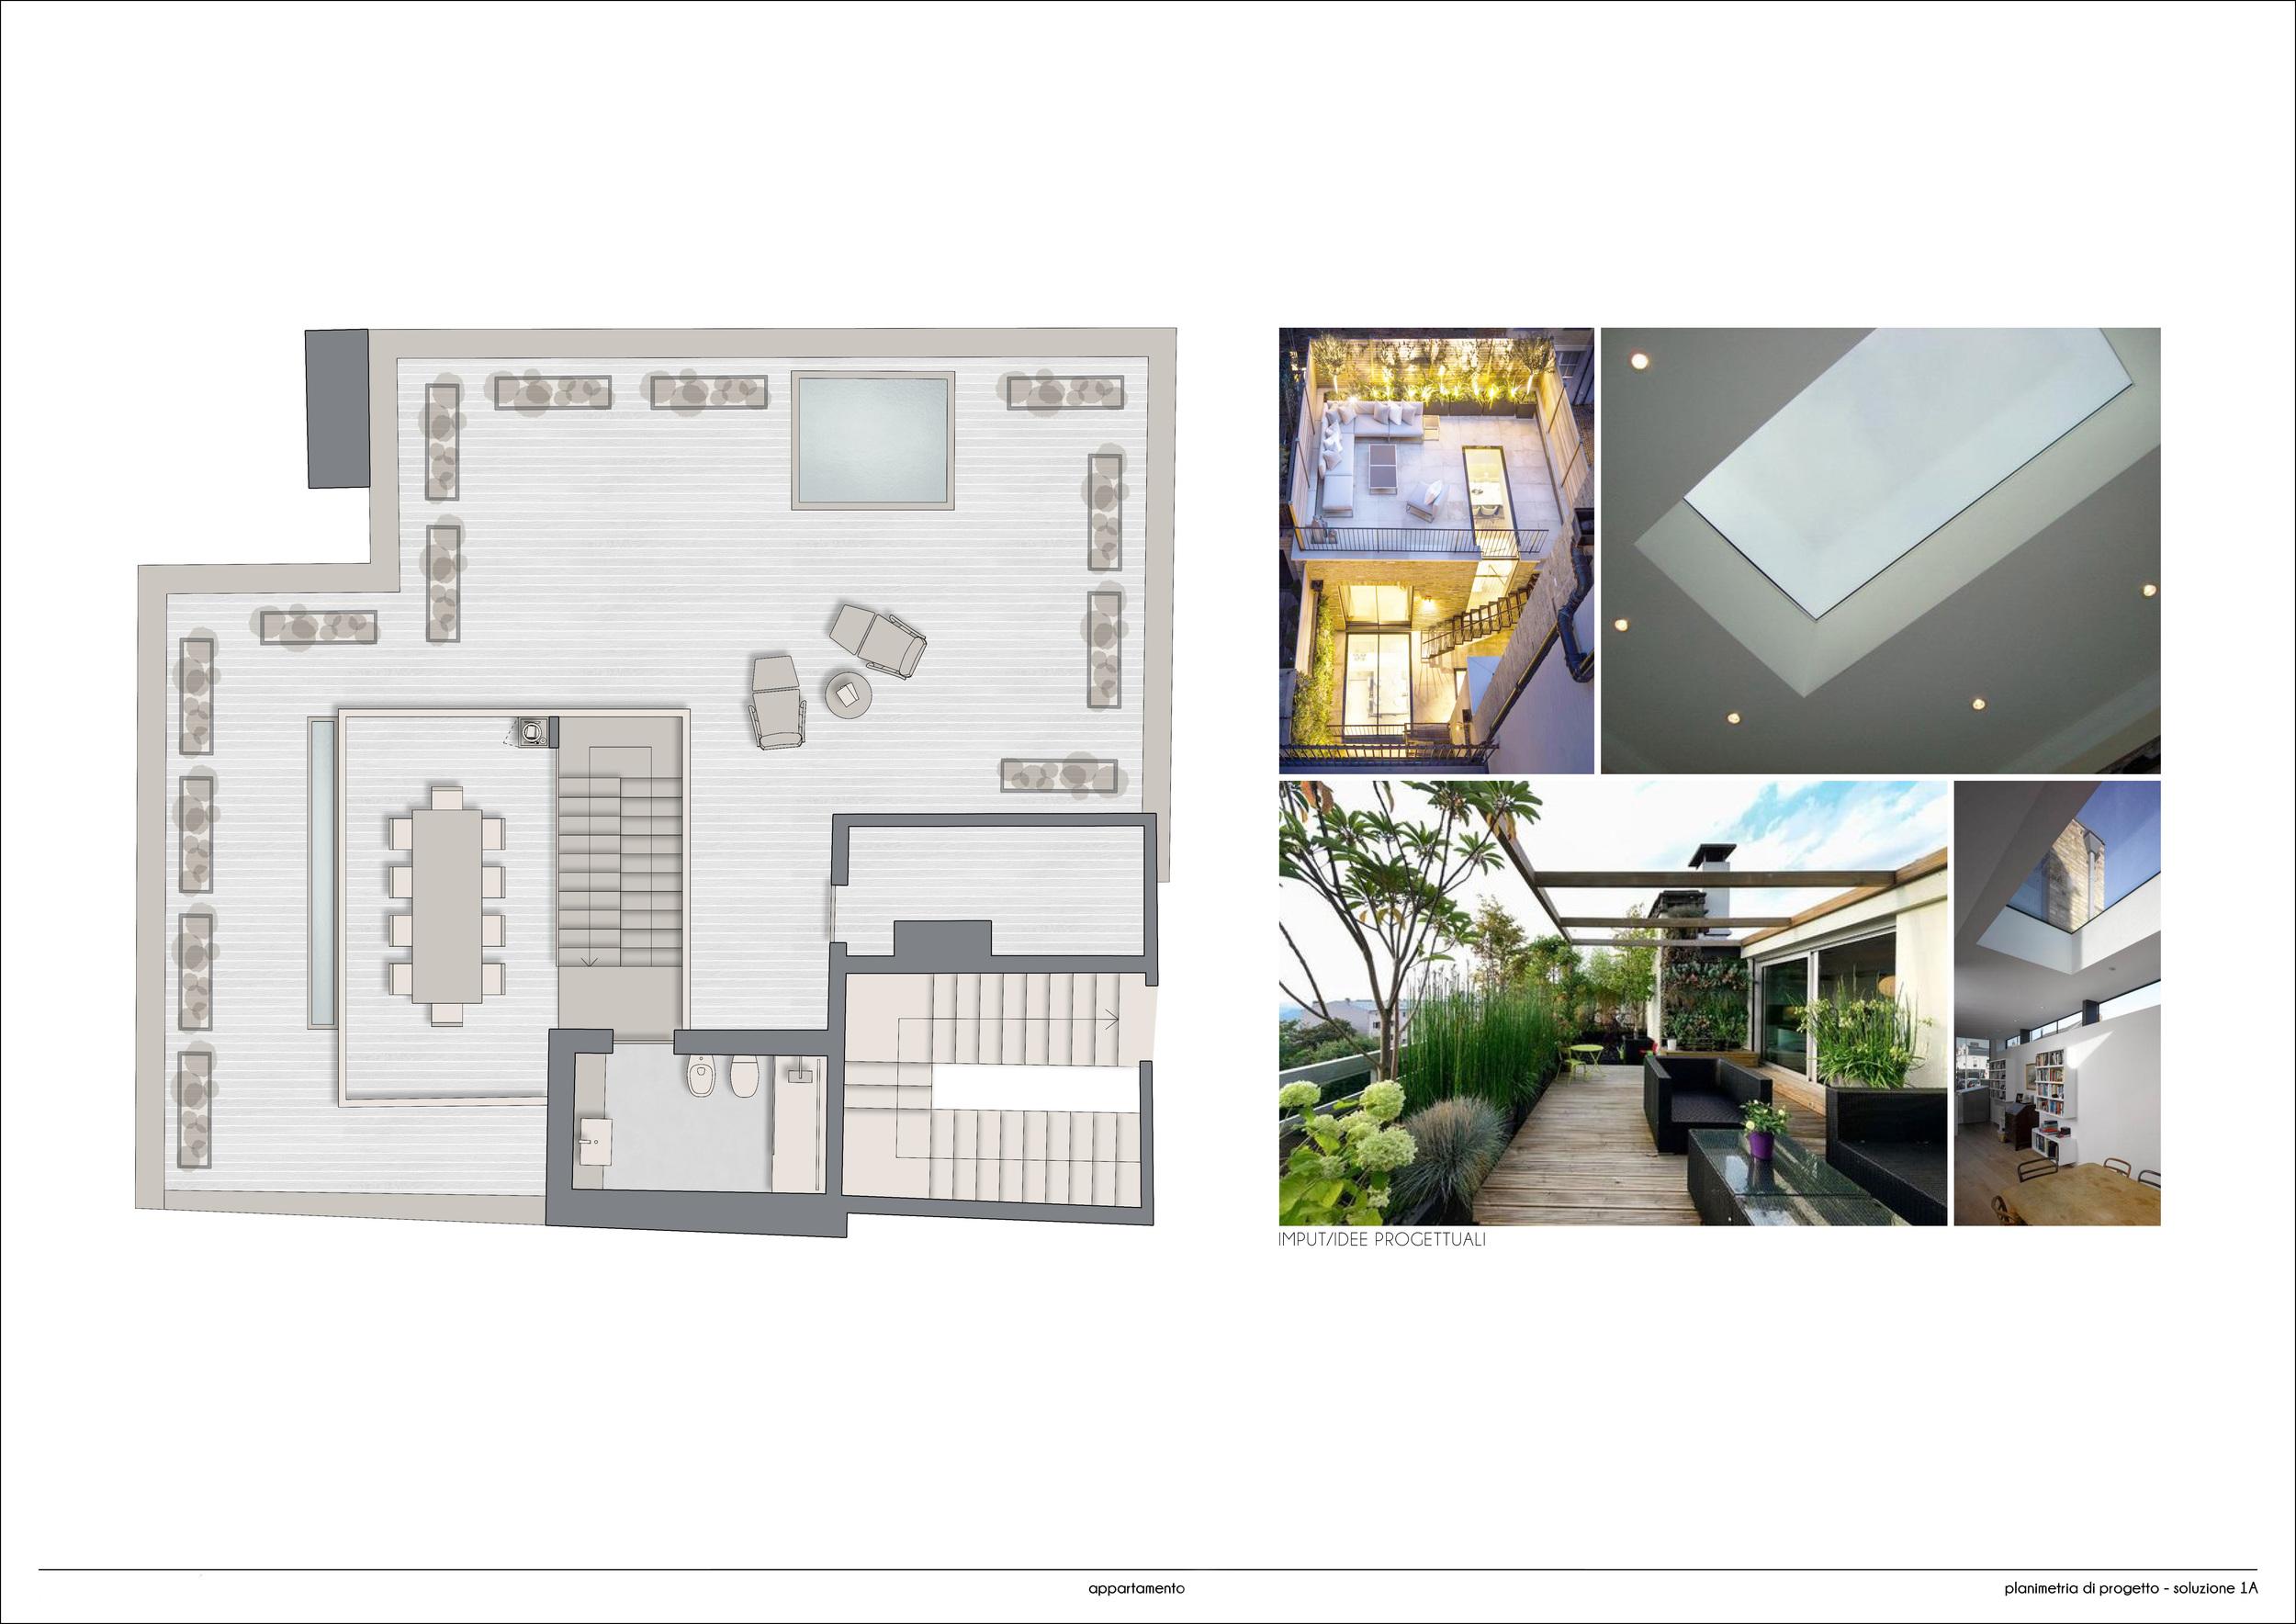 proposta 1_1.jpg